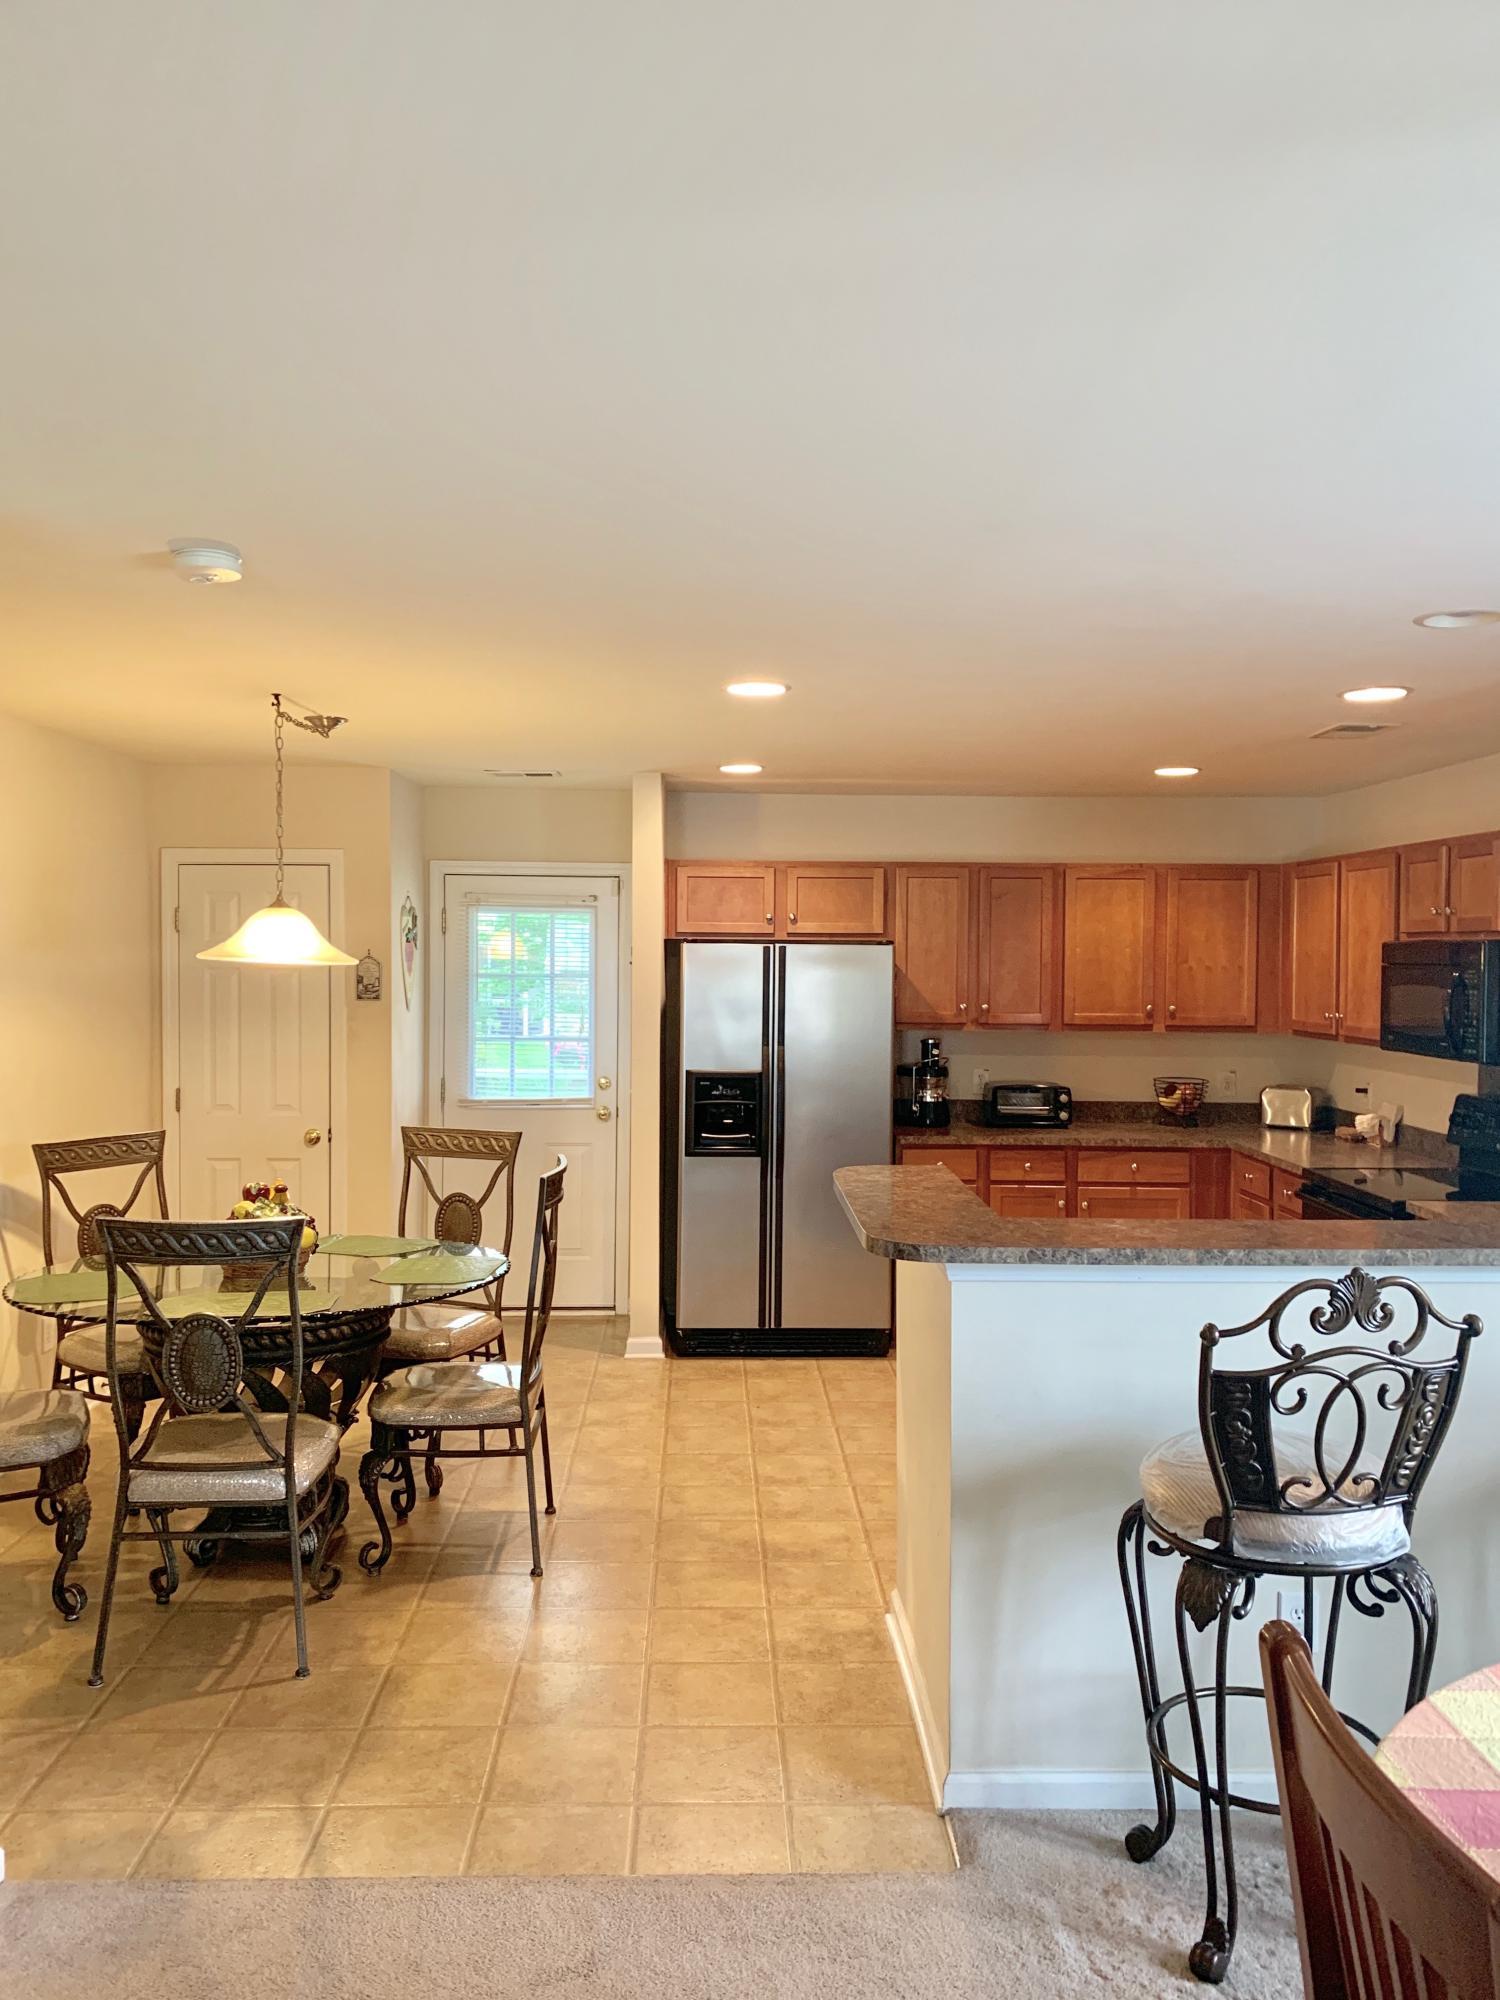 Hunters Bend Homes For Sale - 2036 Cripplecreek, Ladson, SC - 18